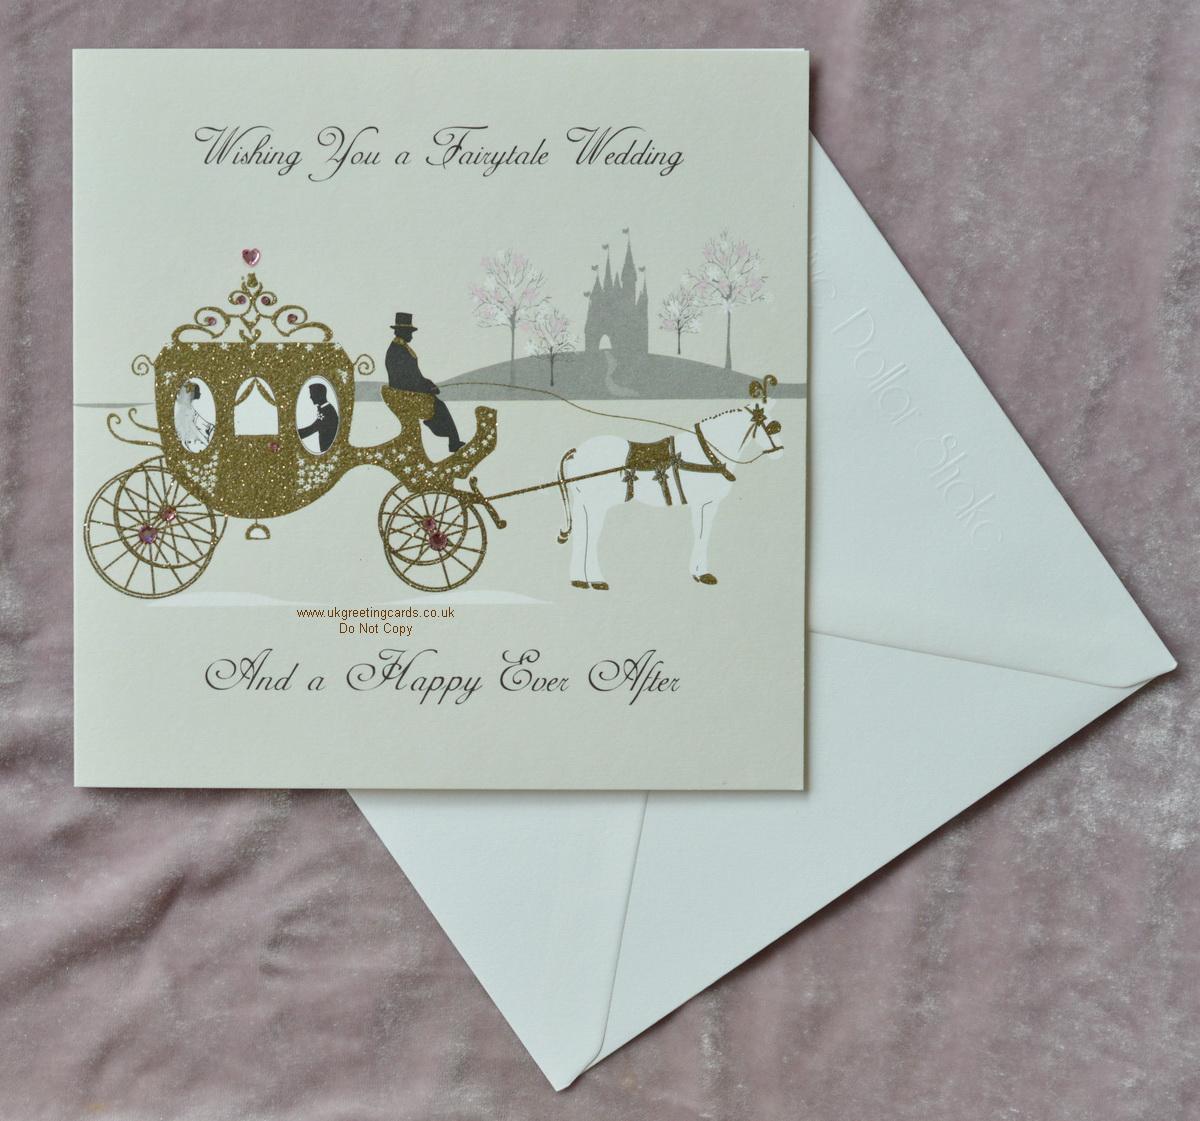 Handmade Greeting Cards Blog: Handmade Wedding Cards